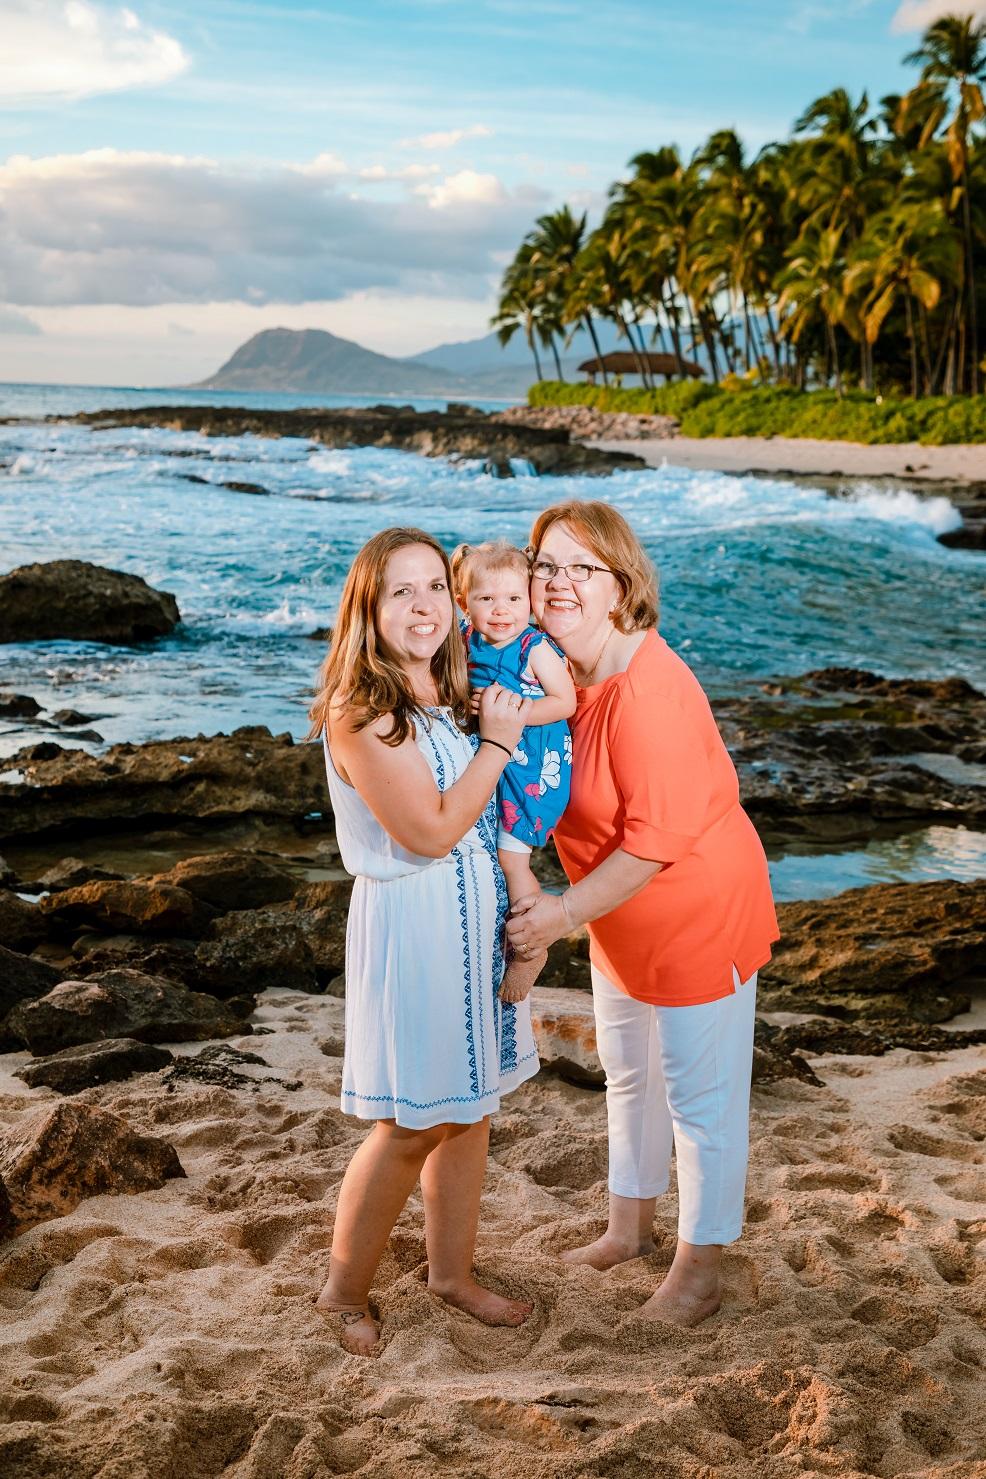 Oahu2018-48587.jpg